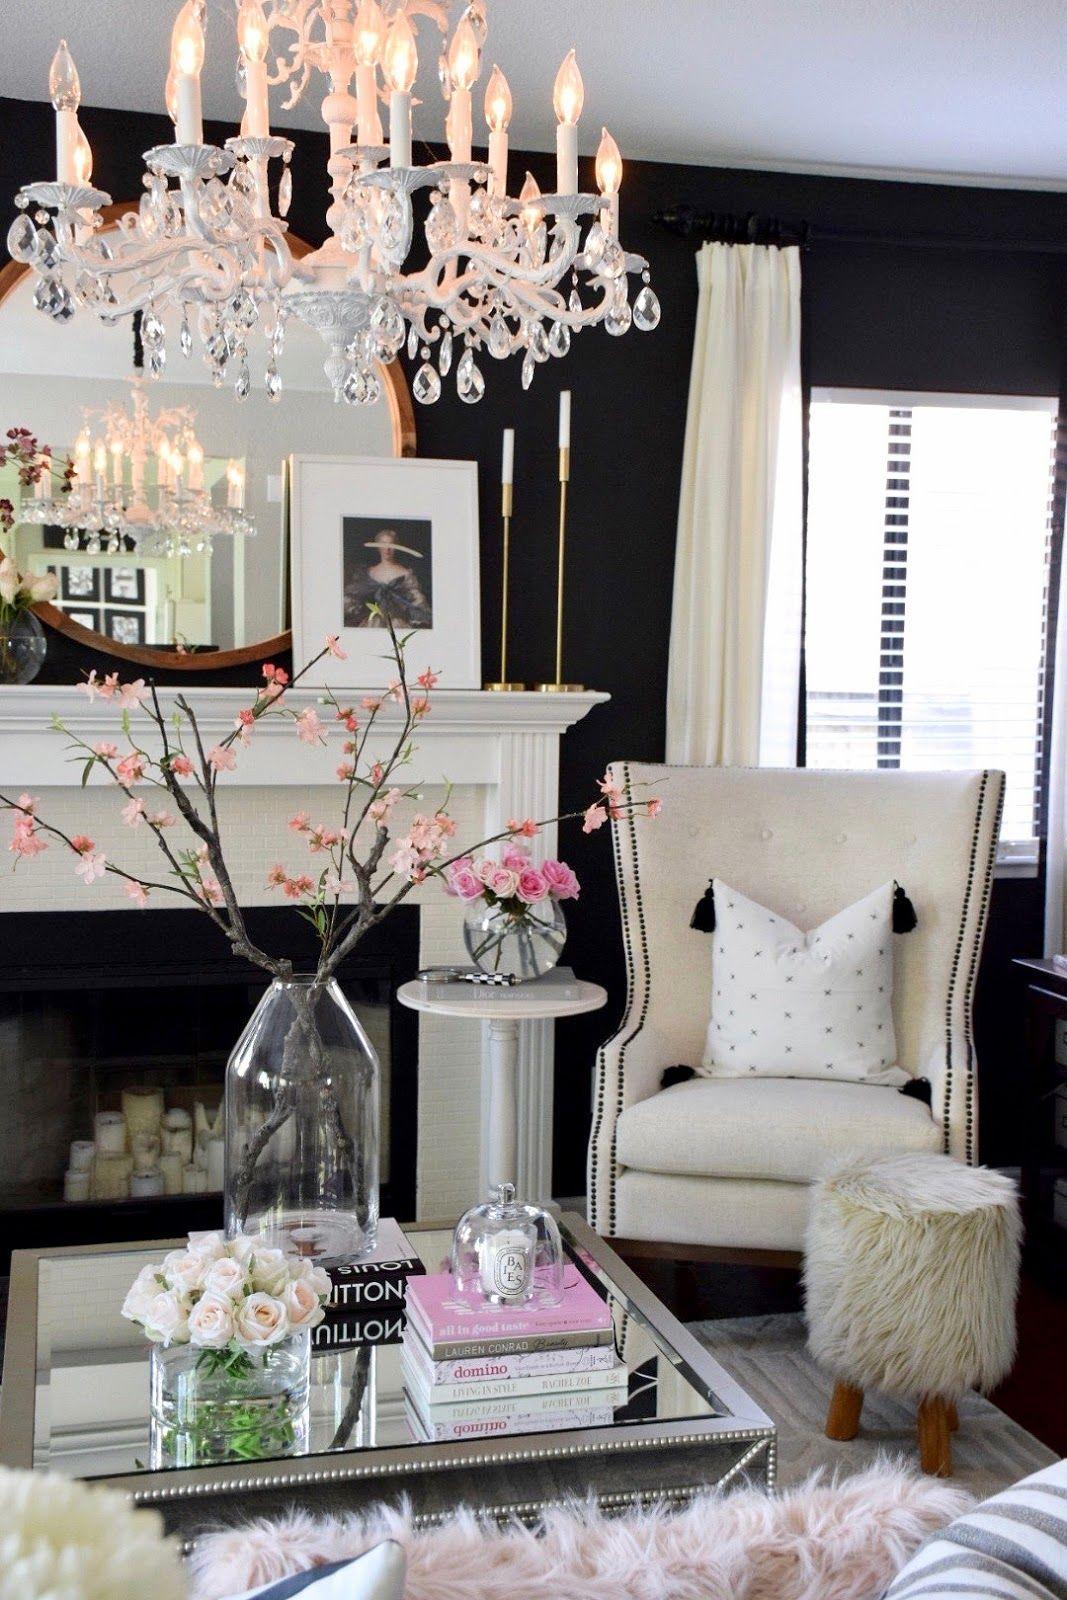 Home And Fabulous 2018 Spring Home Tour Elegant Living Room Decor Home Decor Decor Home goods decor for living room pics